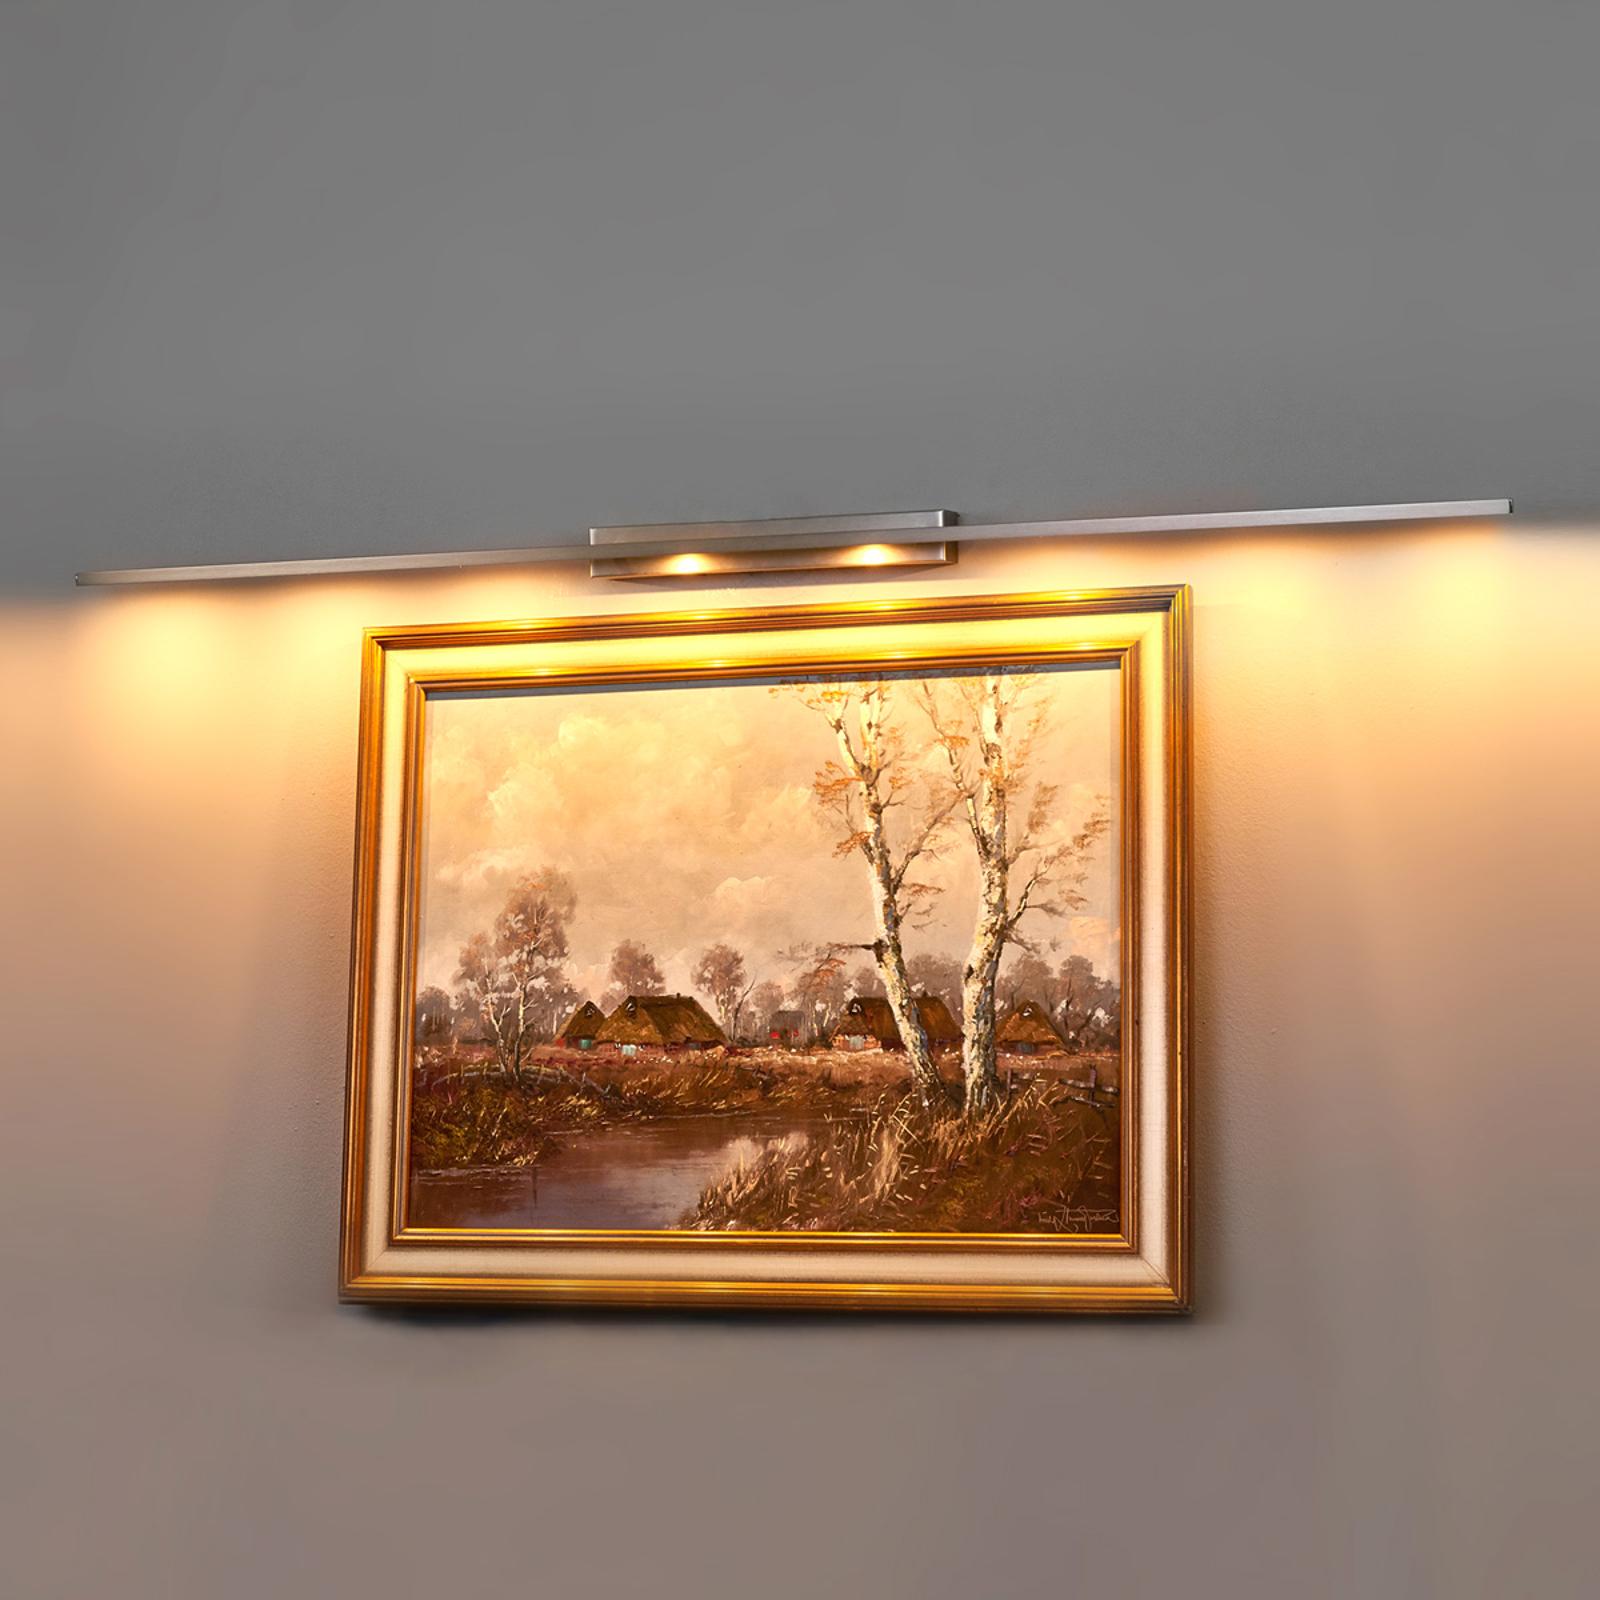 Rörlig LED-tavellampa Tolu med modernt utseende